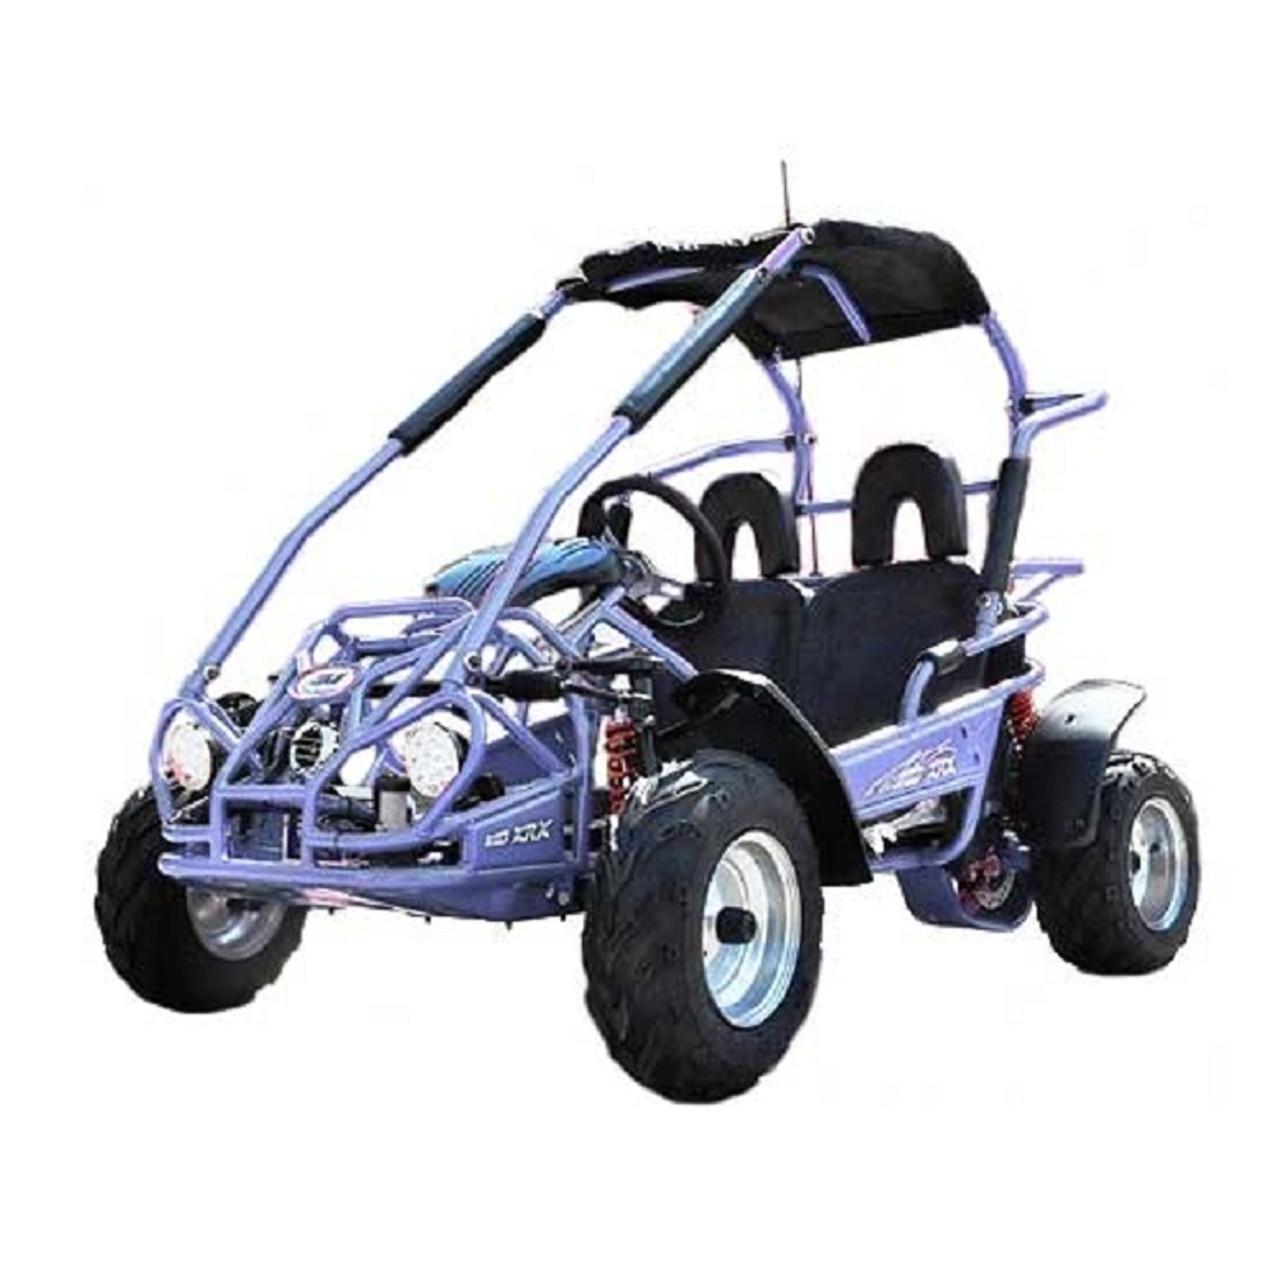 Trail Master Gokart Type MID XRX  (California Legal) - [Back Ordered Until: September]